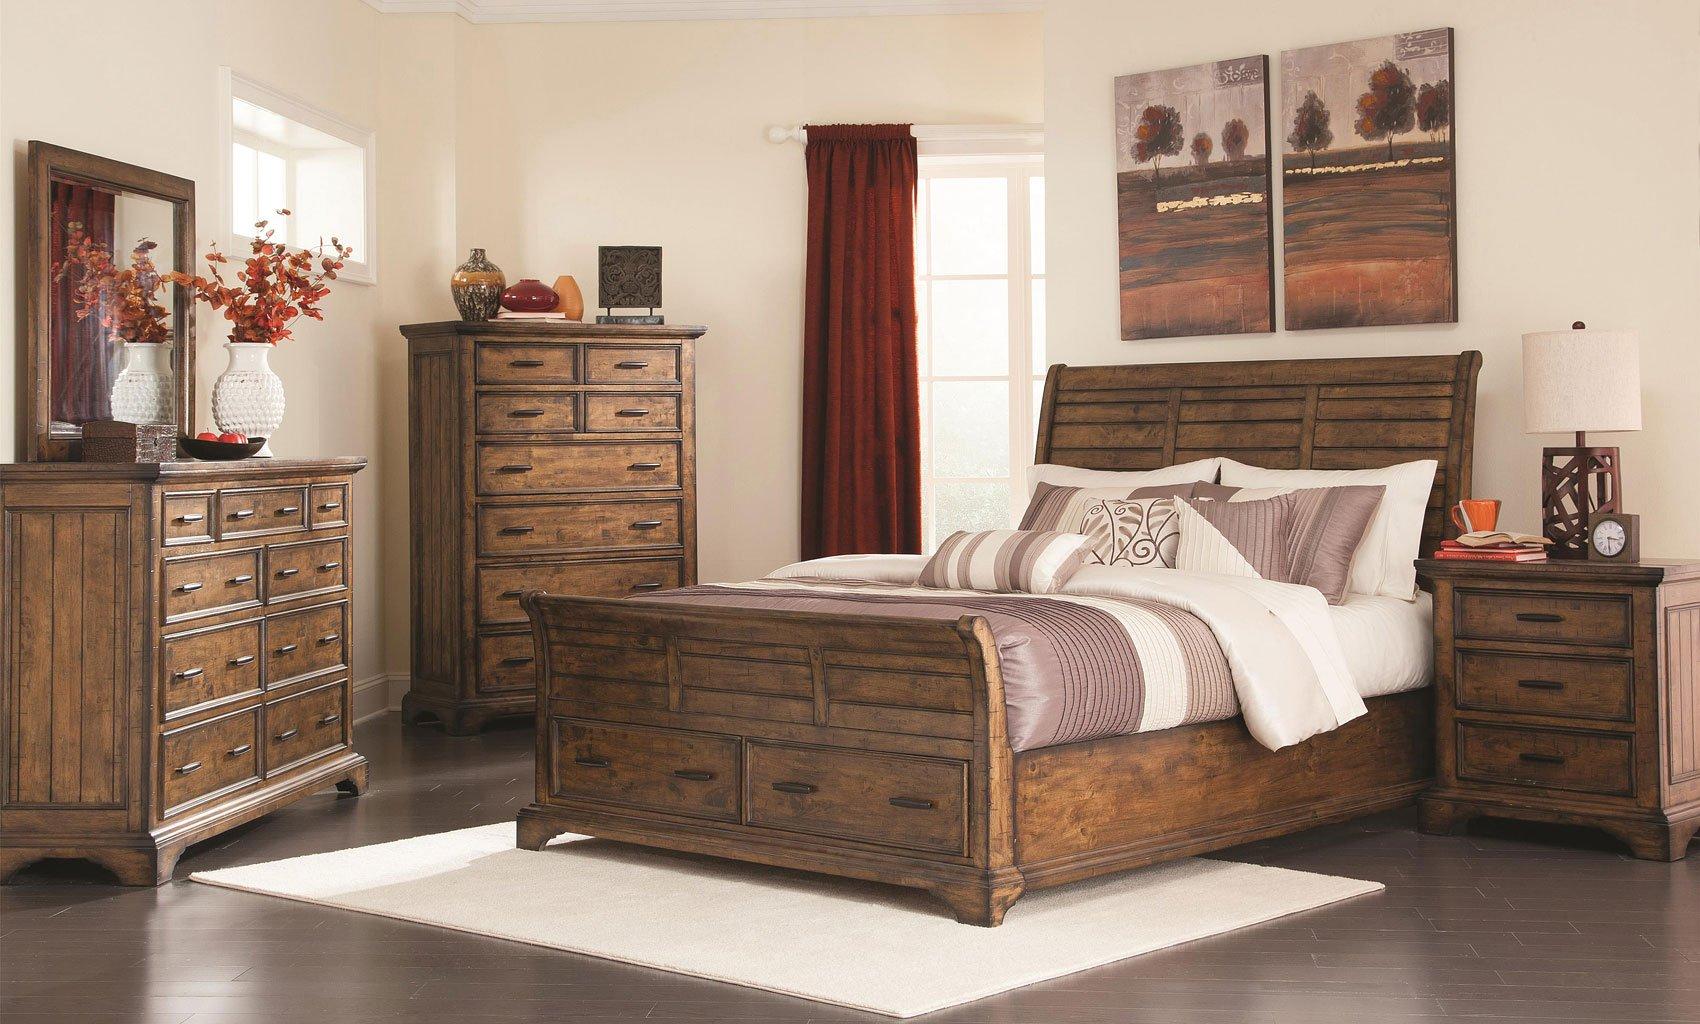 Elk Grove Storage Bedroom Set Bedroom Sets Bedroom Furniture Bedroom